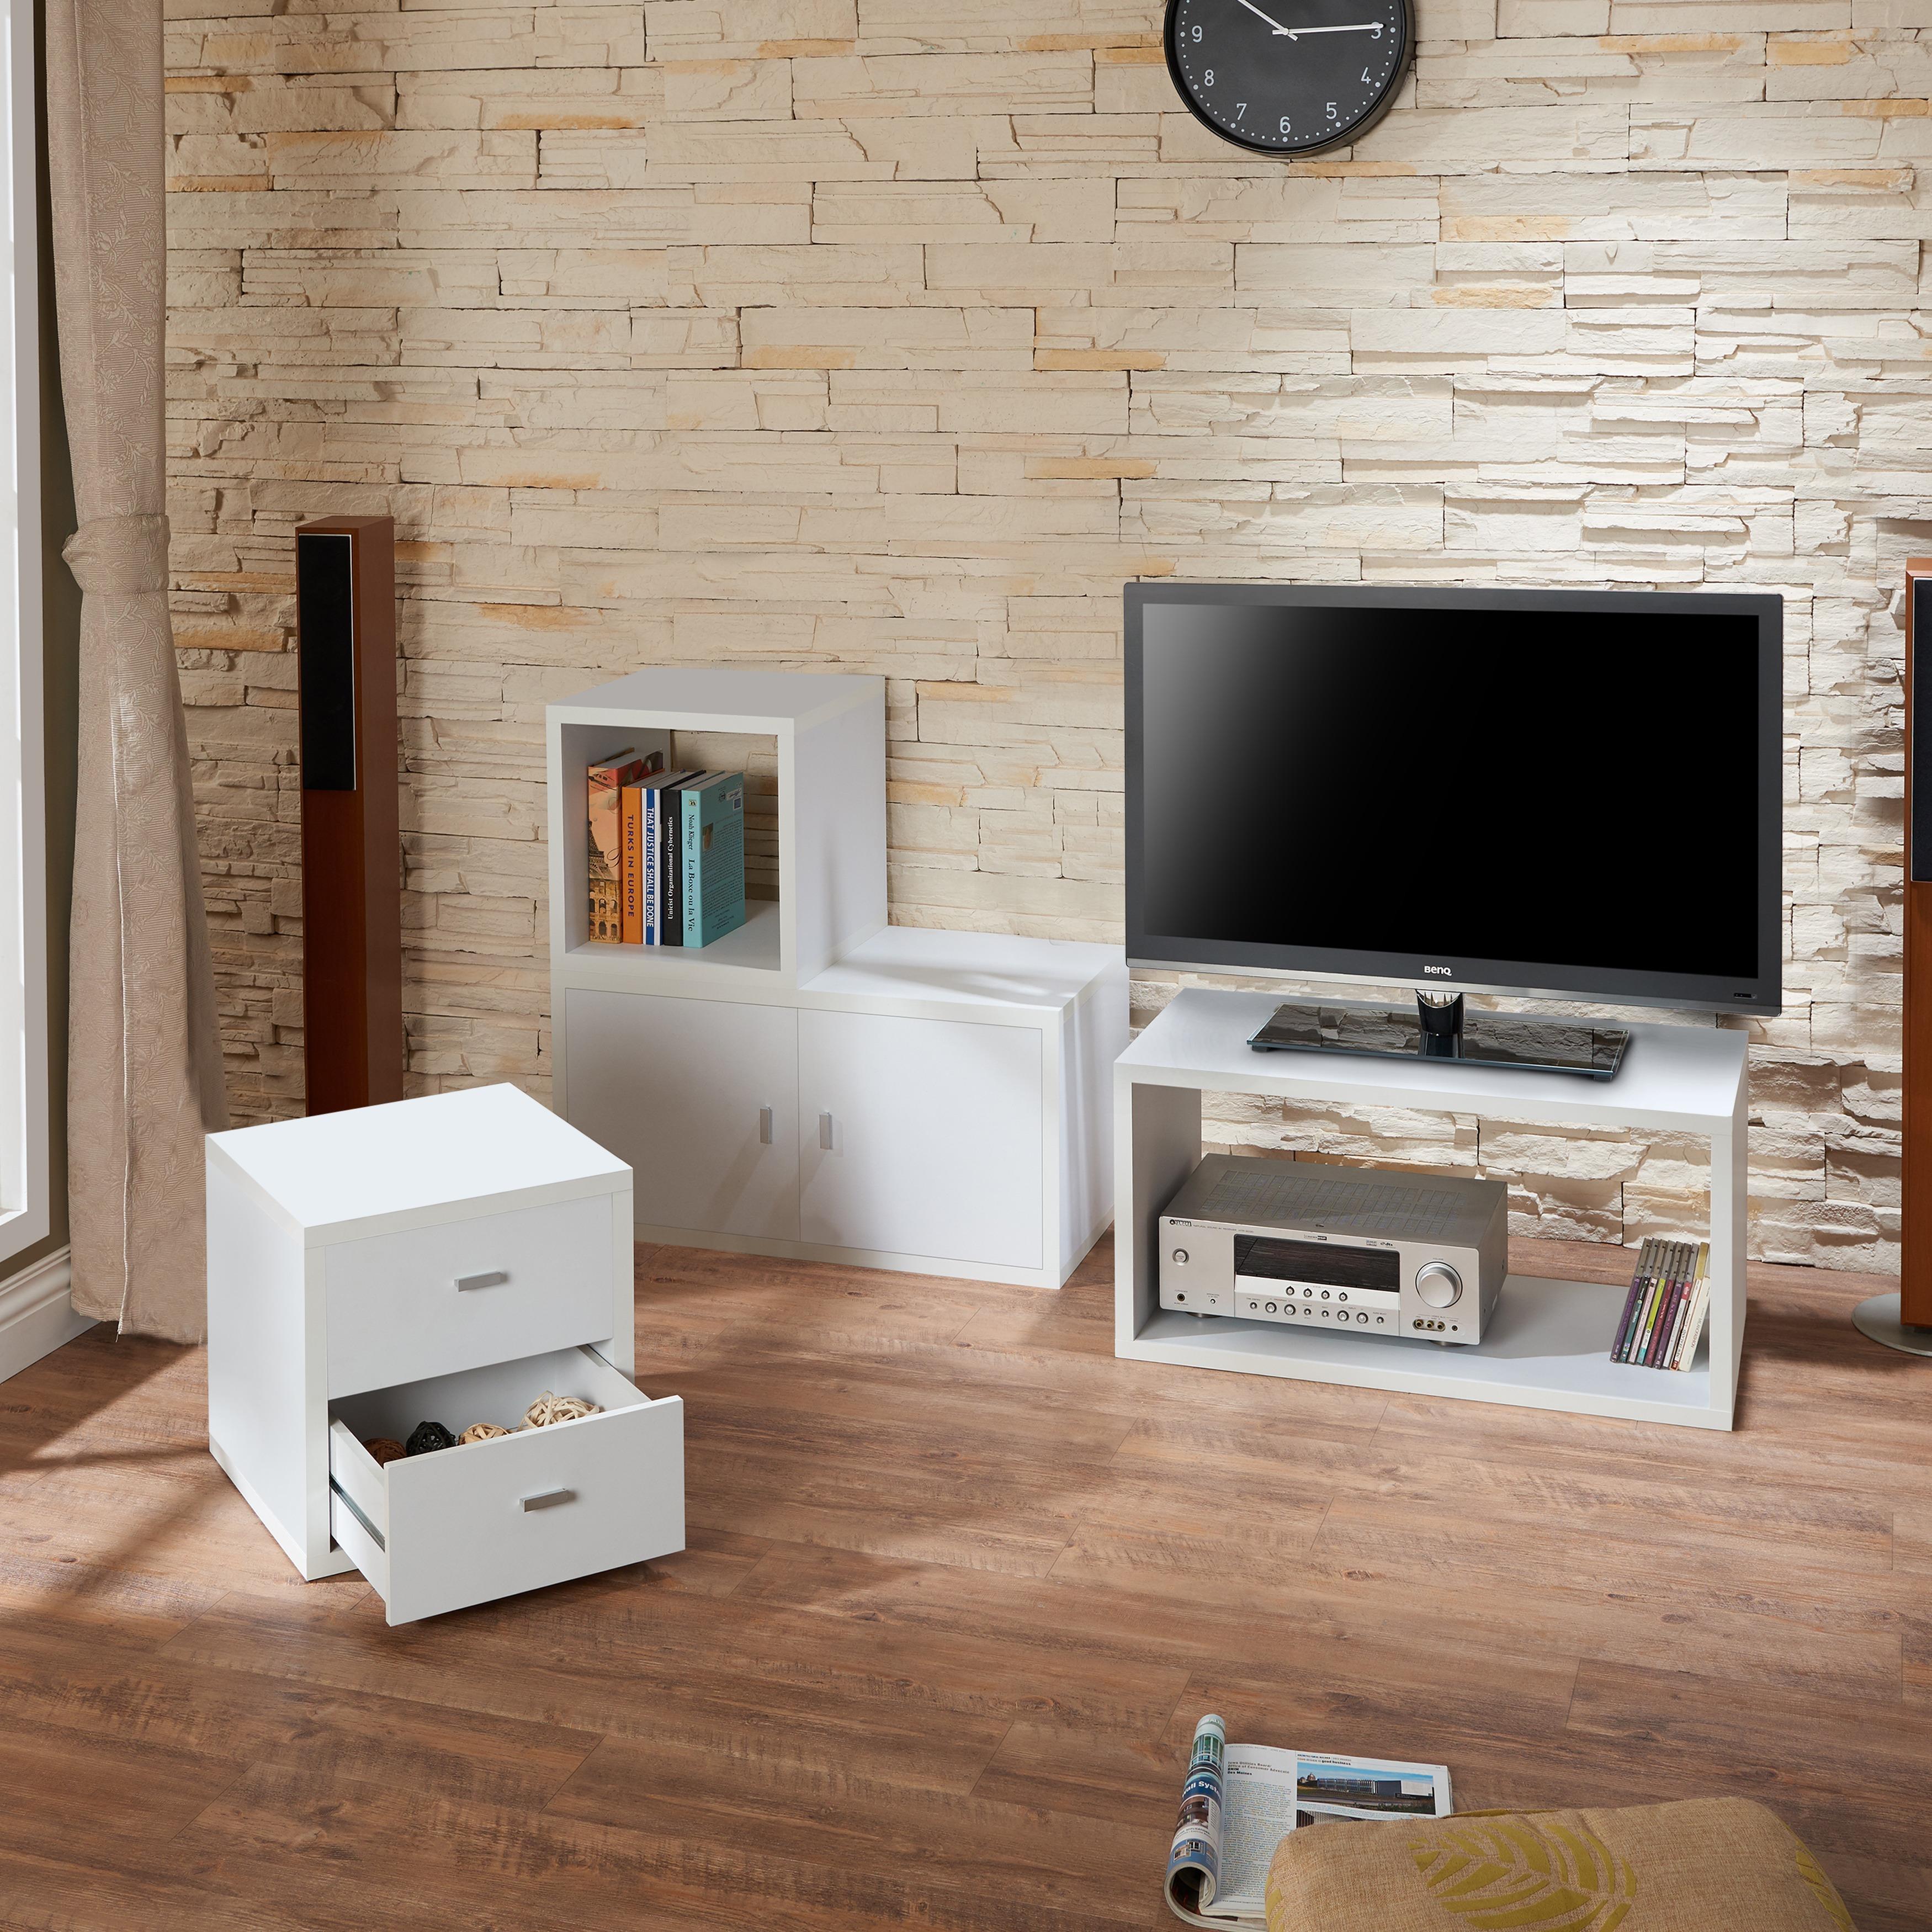 Furniture of America Allure Modular Storage Cabinet in White (Set ...